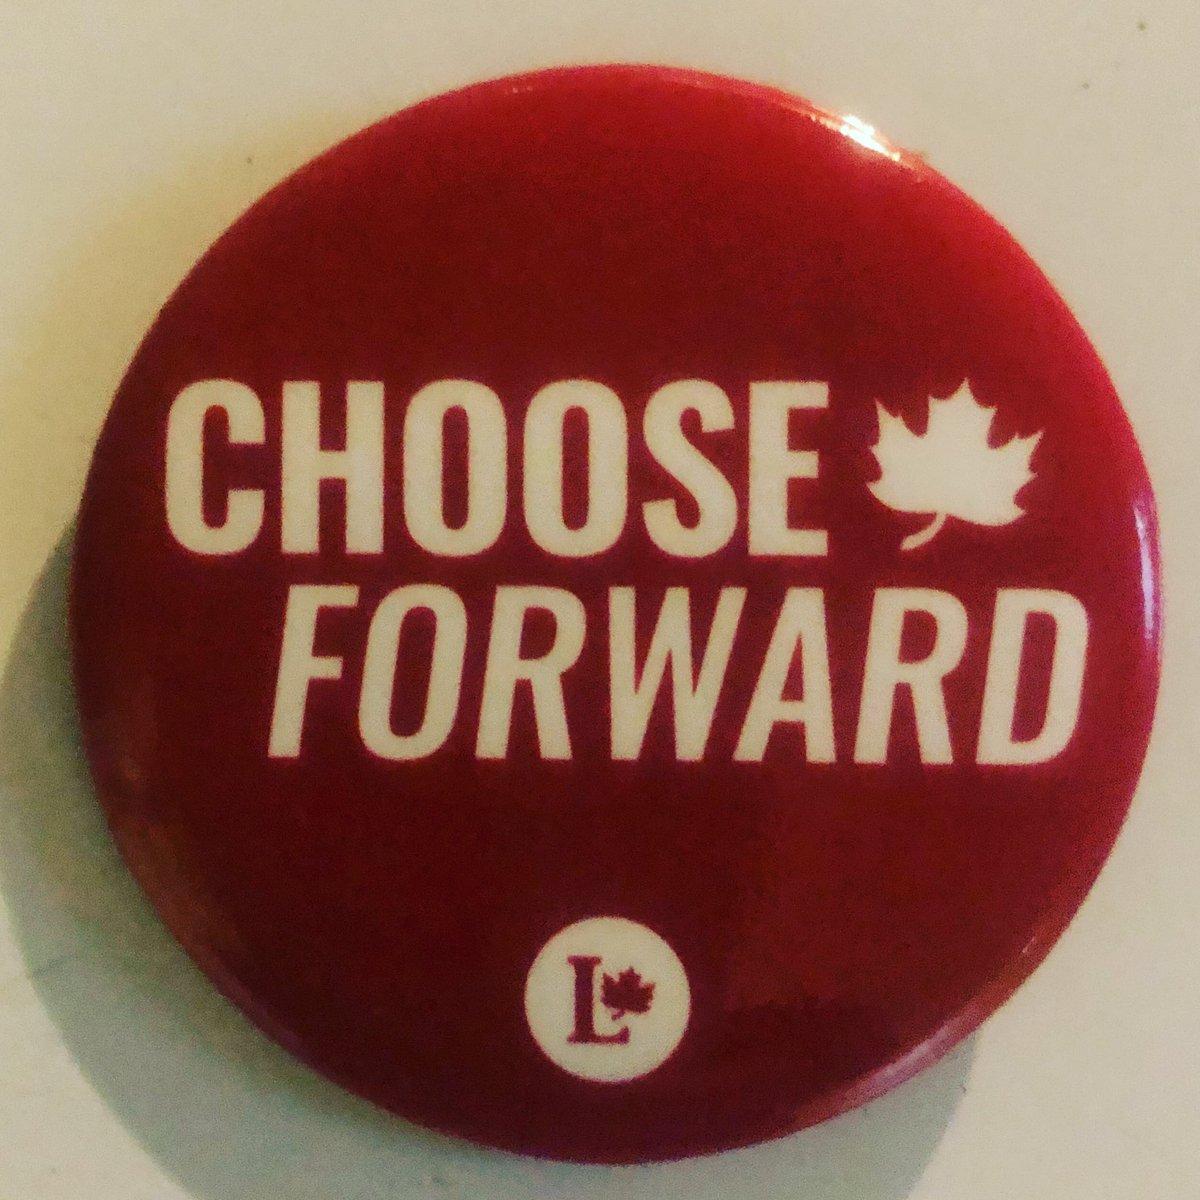 Vote. #ClimateAction #healthcare #education #osap #cdnpoli #elx43 #elxn2019 #HappyThanksgivingCanada #thanksgiving2019 #ChooseForward #scheercuts #cutshurtkids #ETFOStrong #osstf #Liberal #vote2019